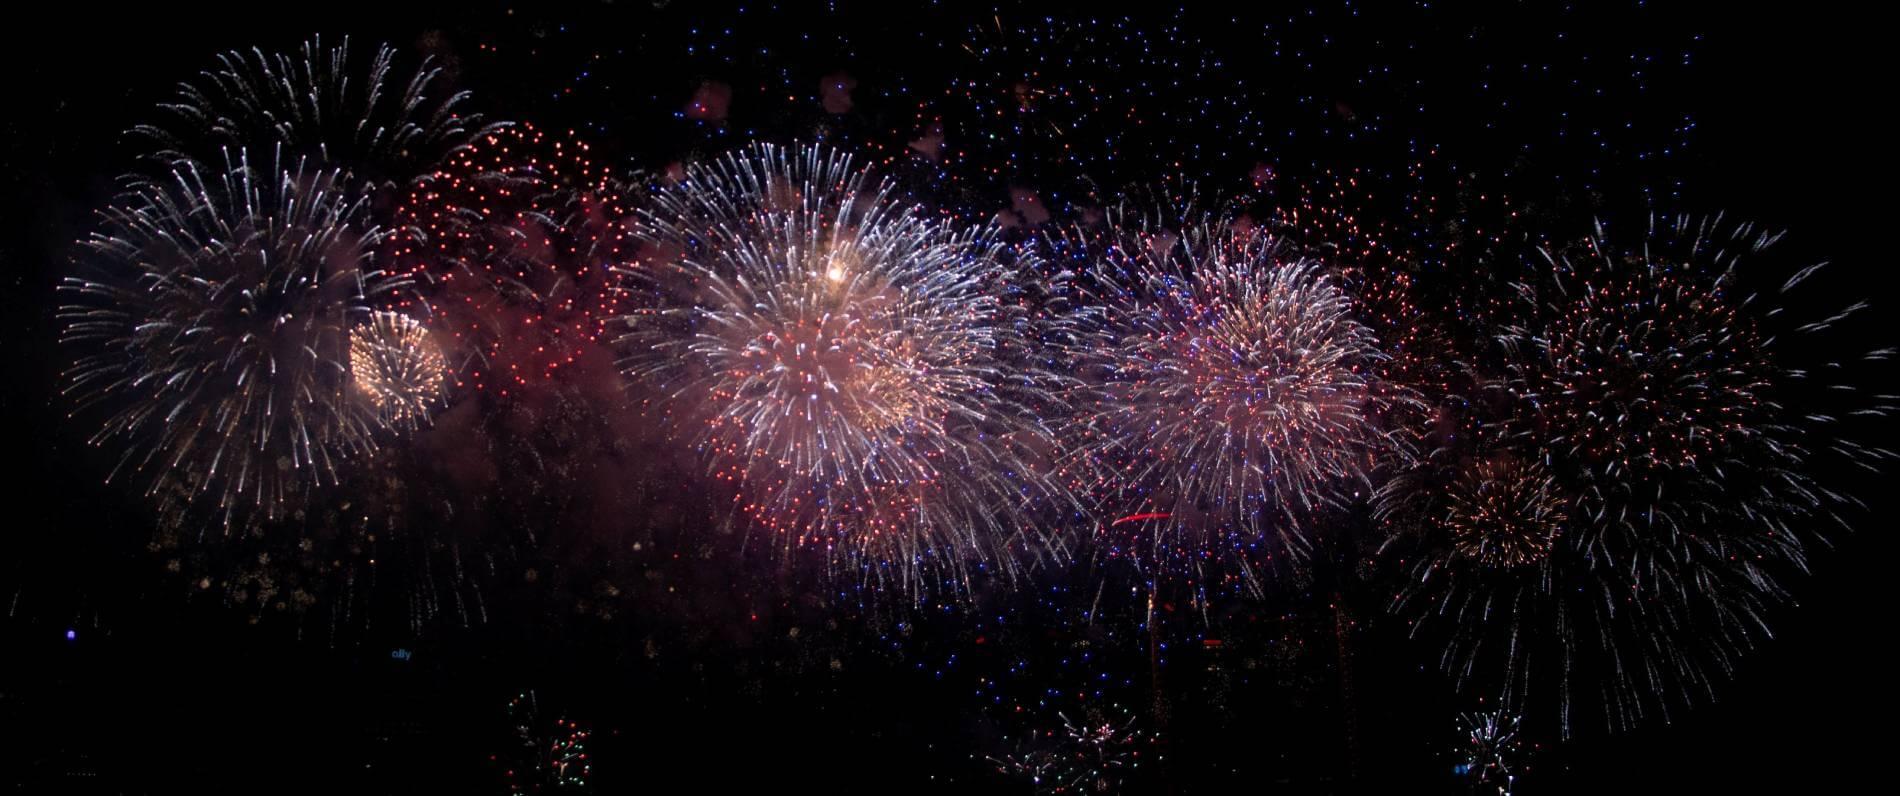 fireworks banner - trust-tru-katsande-718752-unsplash-1